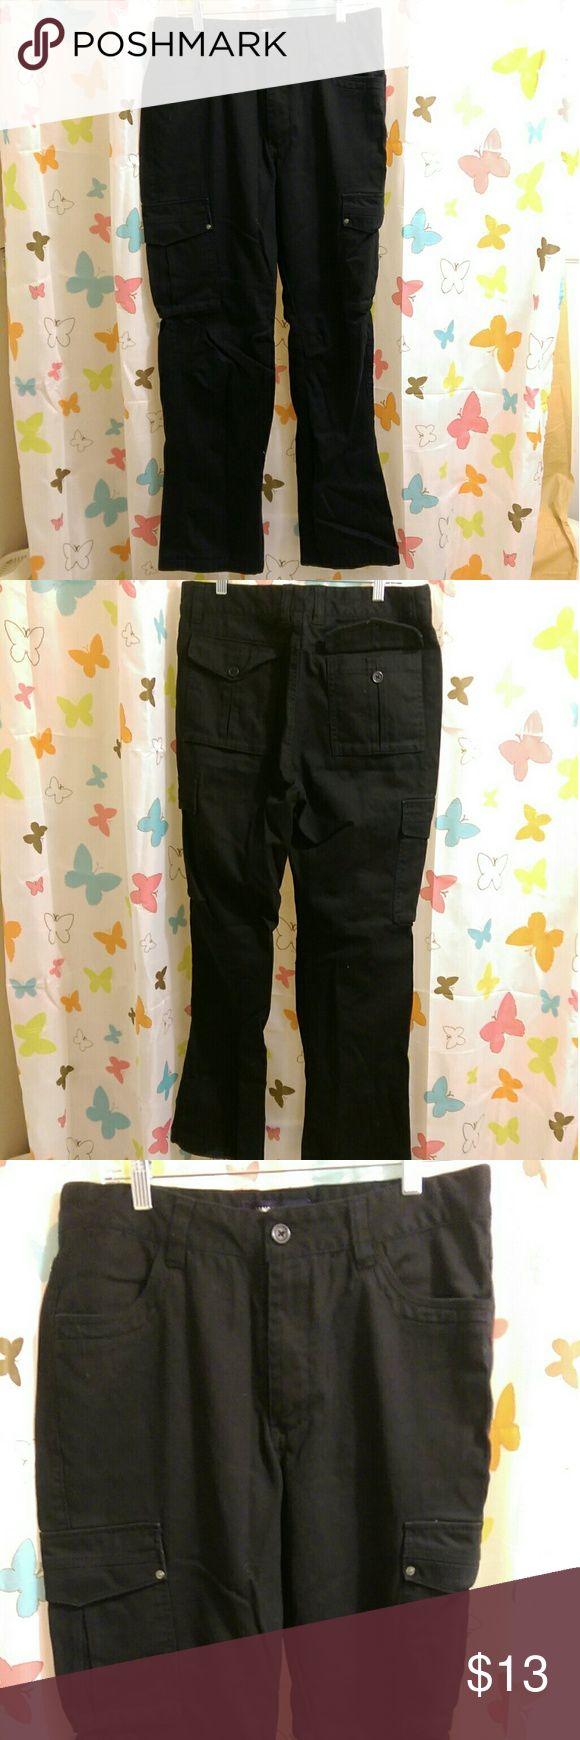 Black khaki pants Black khaki pants Pants Chinos & Khakis